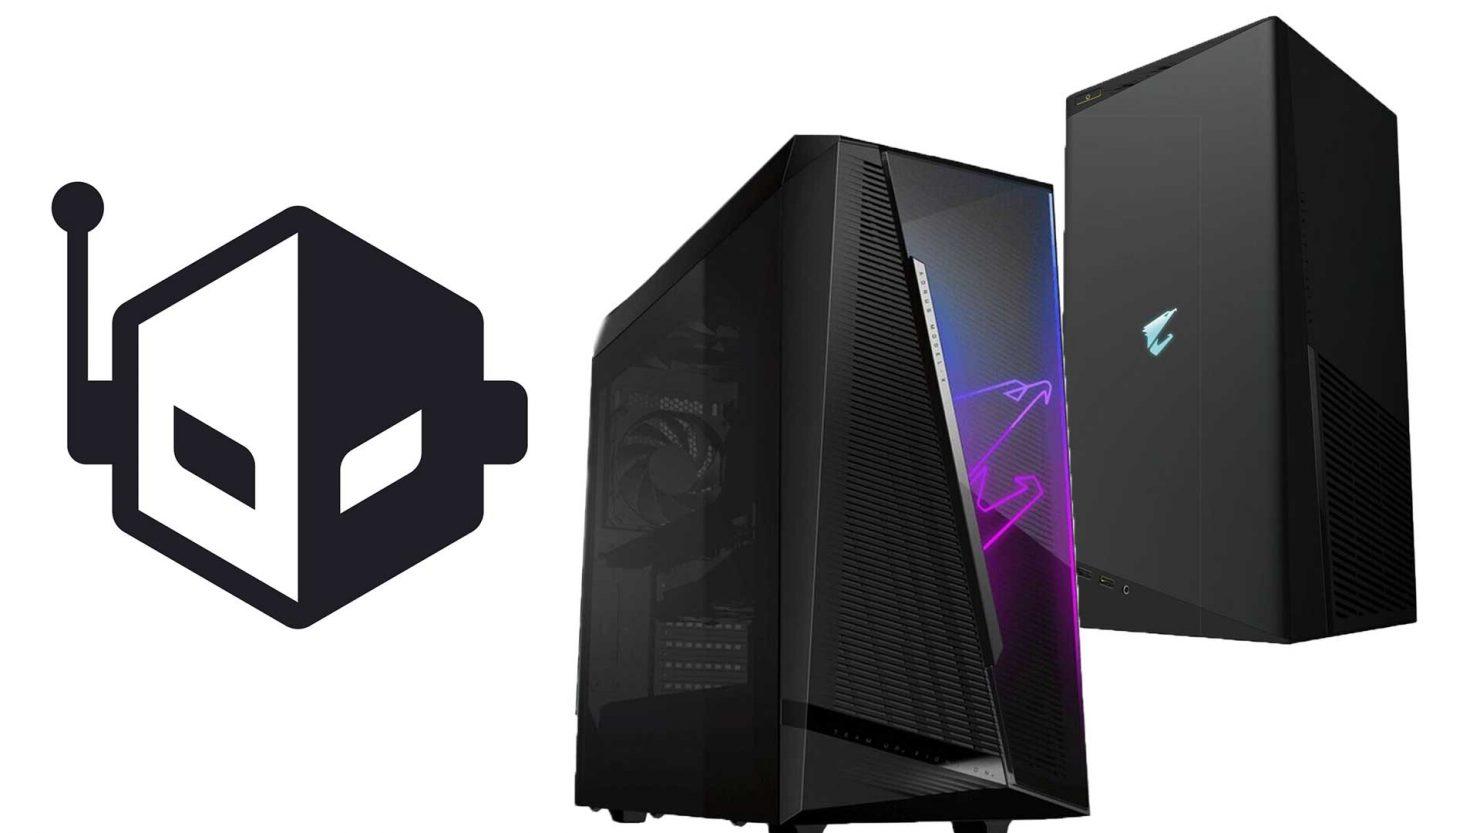 gigabyte-announces-the-aorus-model-x-and-model-s-gaming-pcs!